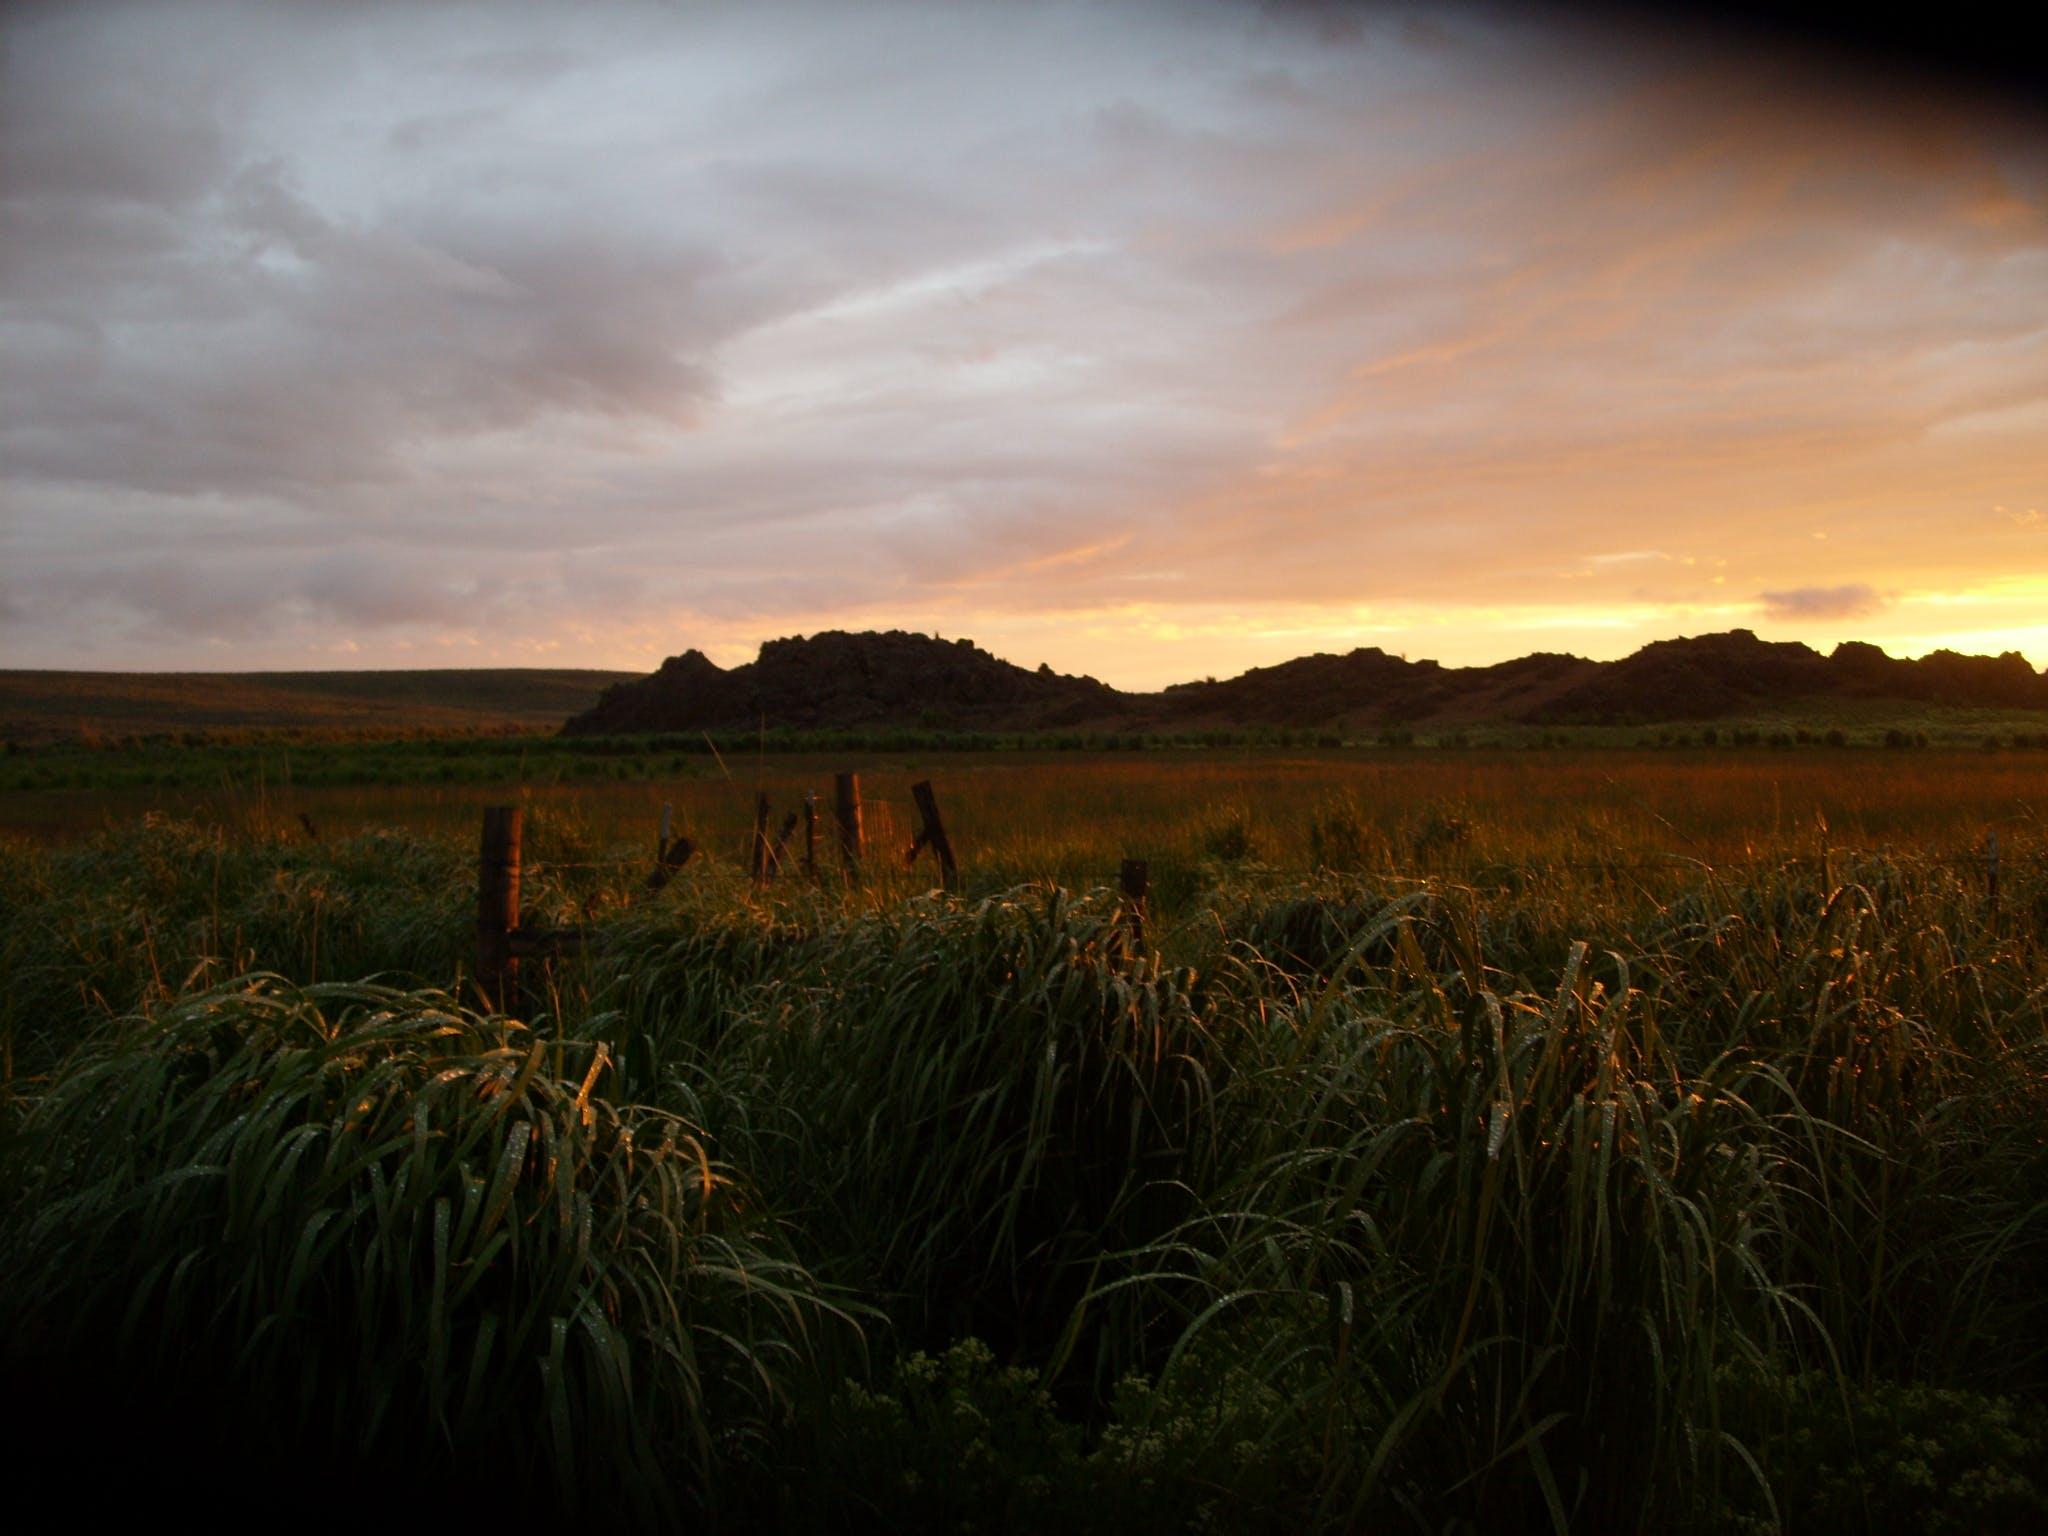 Free stock photo of Joe Leineweber, Eastern Oregon